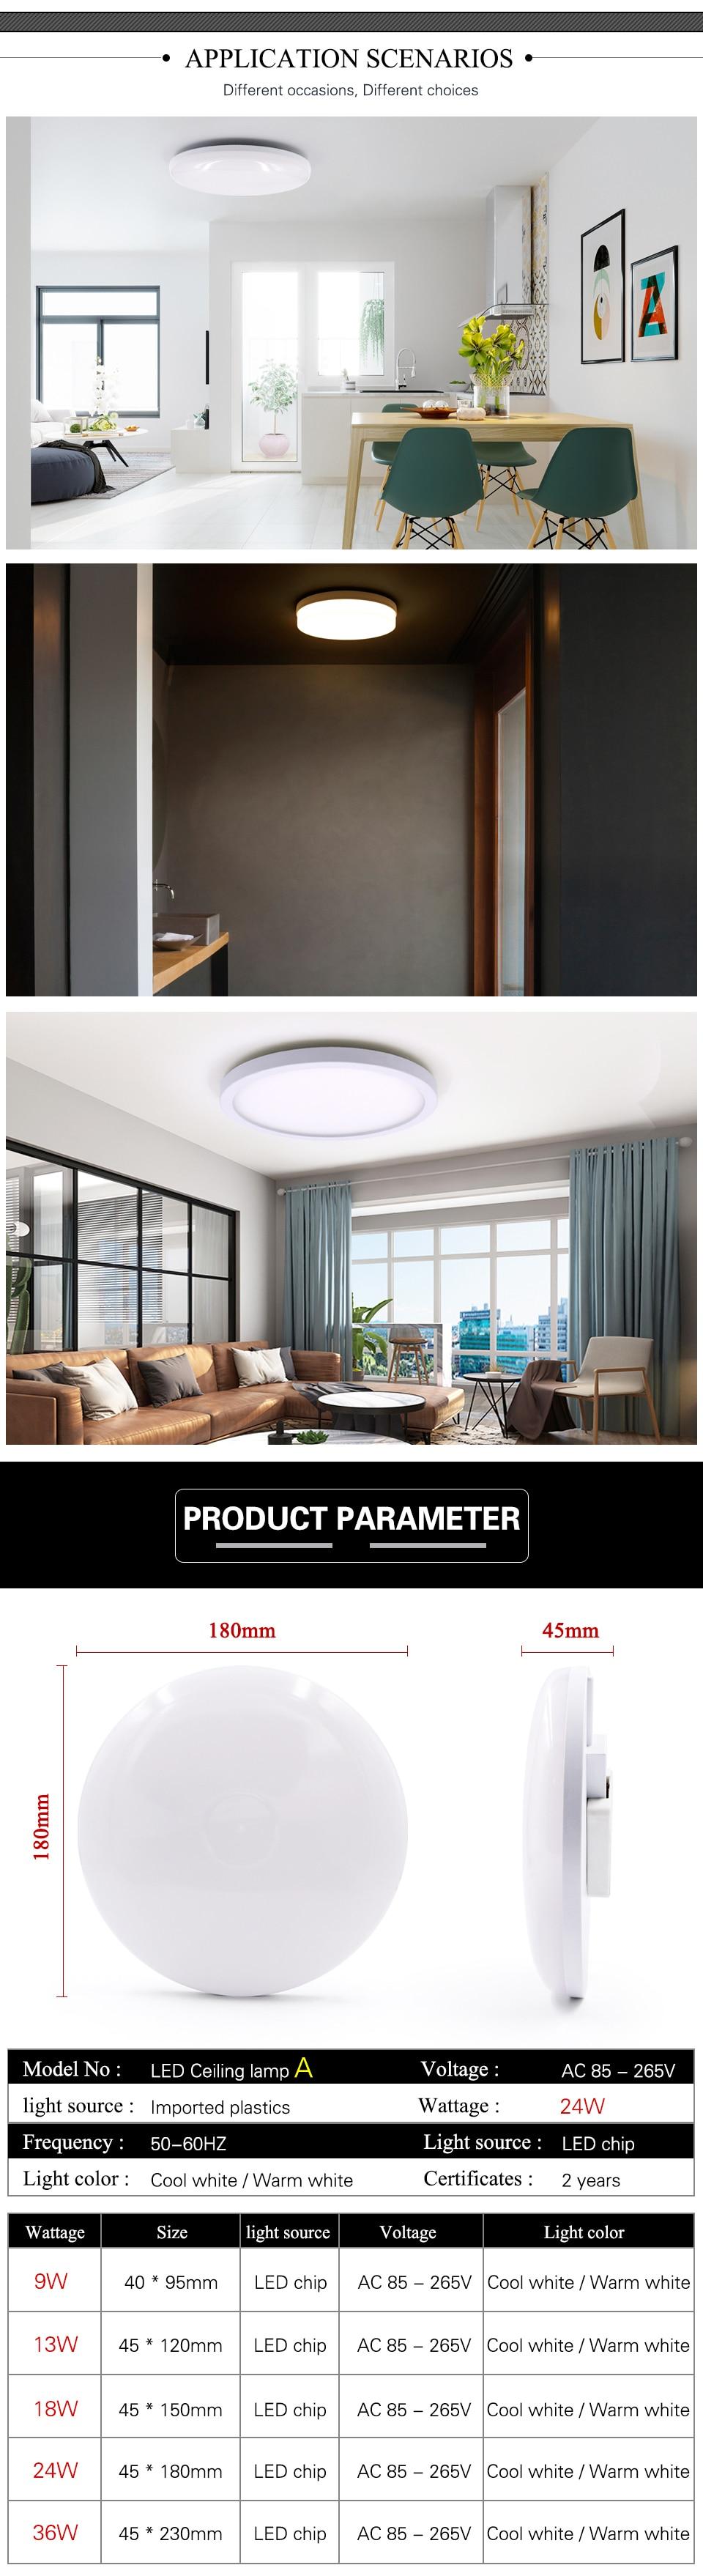 Ha31240afedc84c65ab78b3a804f5165aK EnwYe 6W 9W 13W 18W 24W 36W 48W LED Circular Panel Light Surface Mounted led ceiling light AC 85-265V lampada led lamp